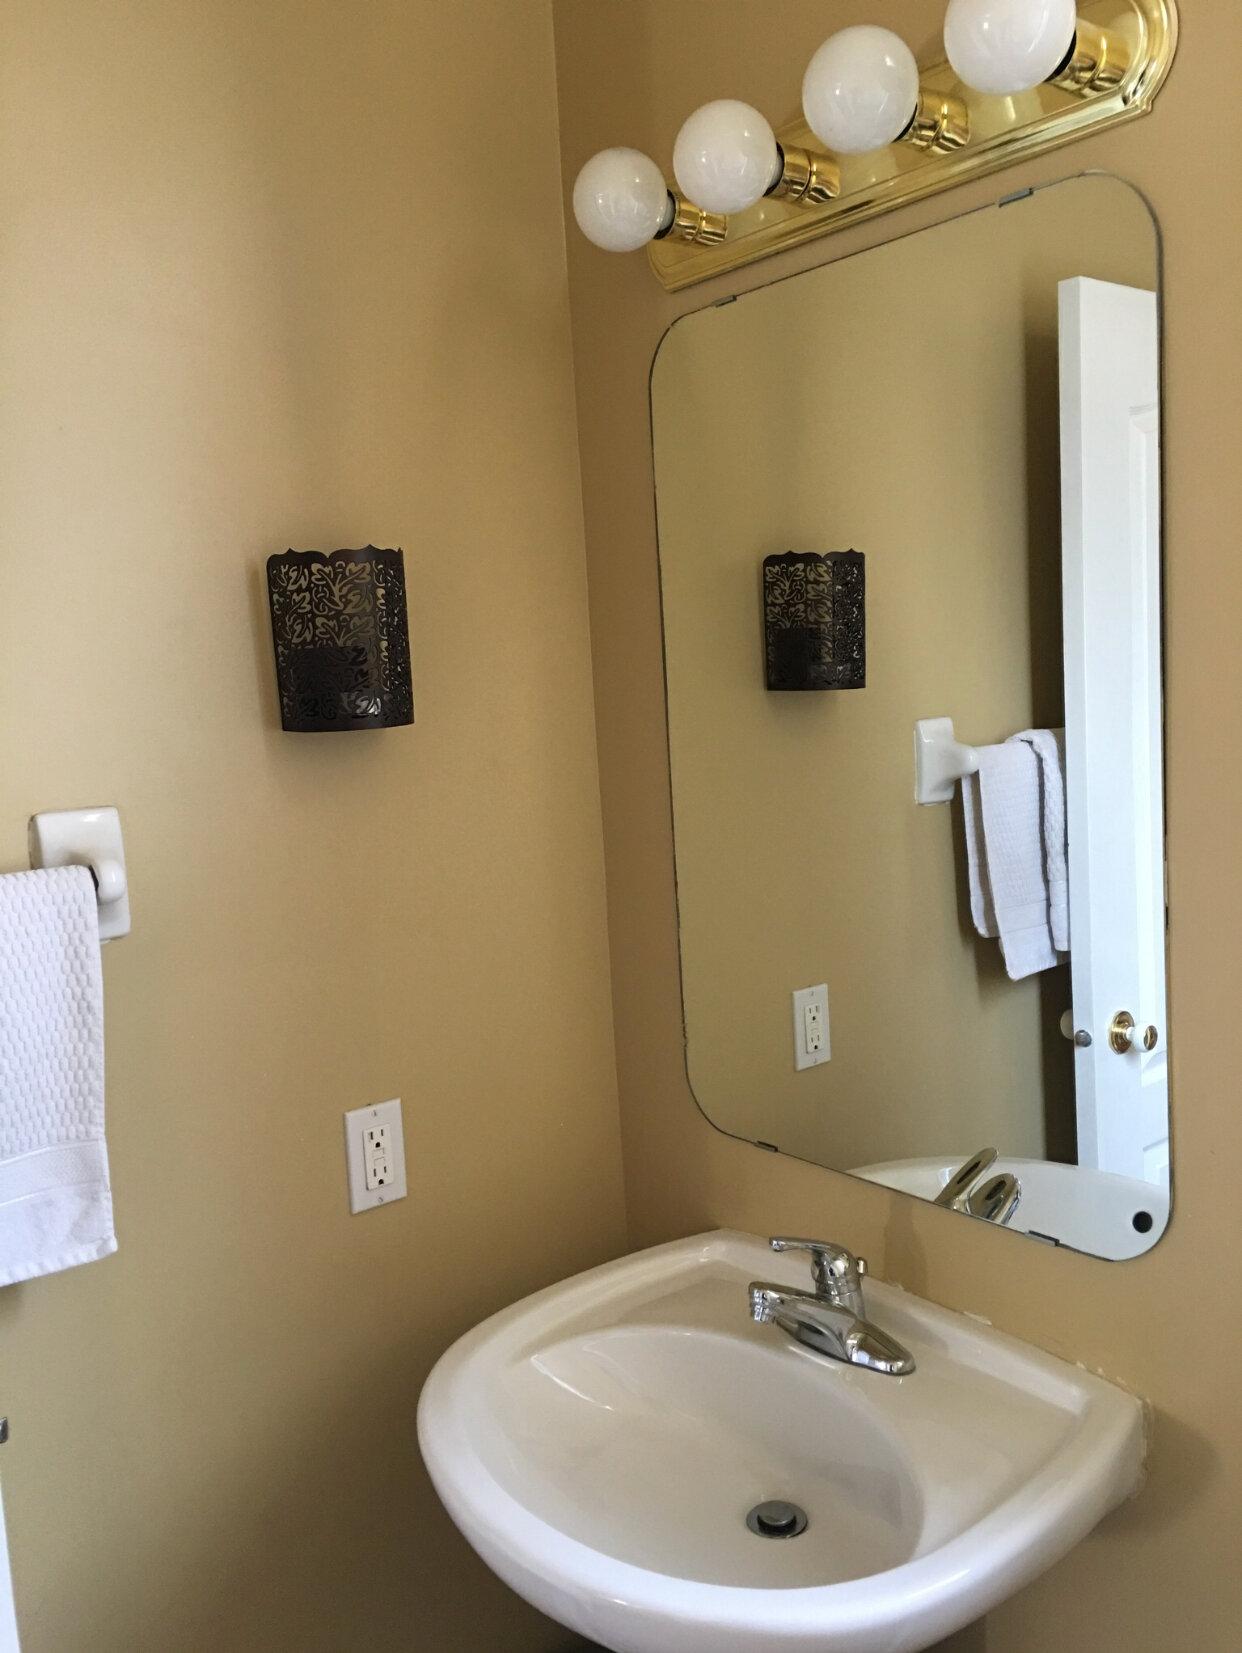 Leclair Decor Powder Room Reveal Orleans Ottawa Interior Design Firm